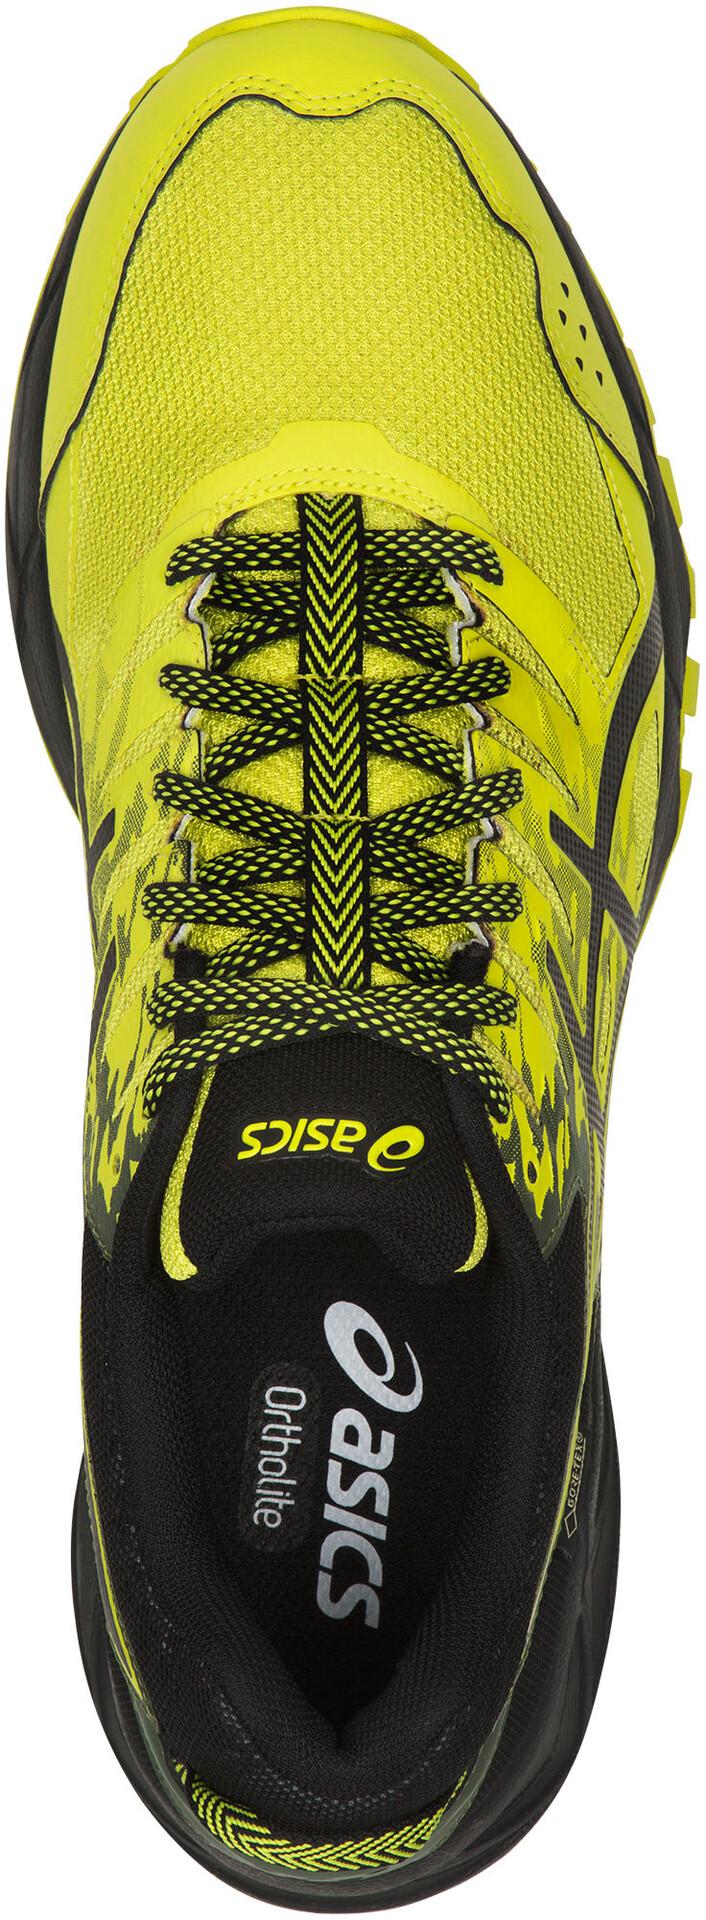 Chaussures G Gel Jaunenoir Sonoma Tx 3 Running Asics Homme XwH7qxCX